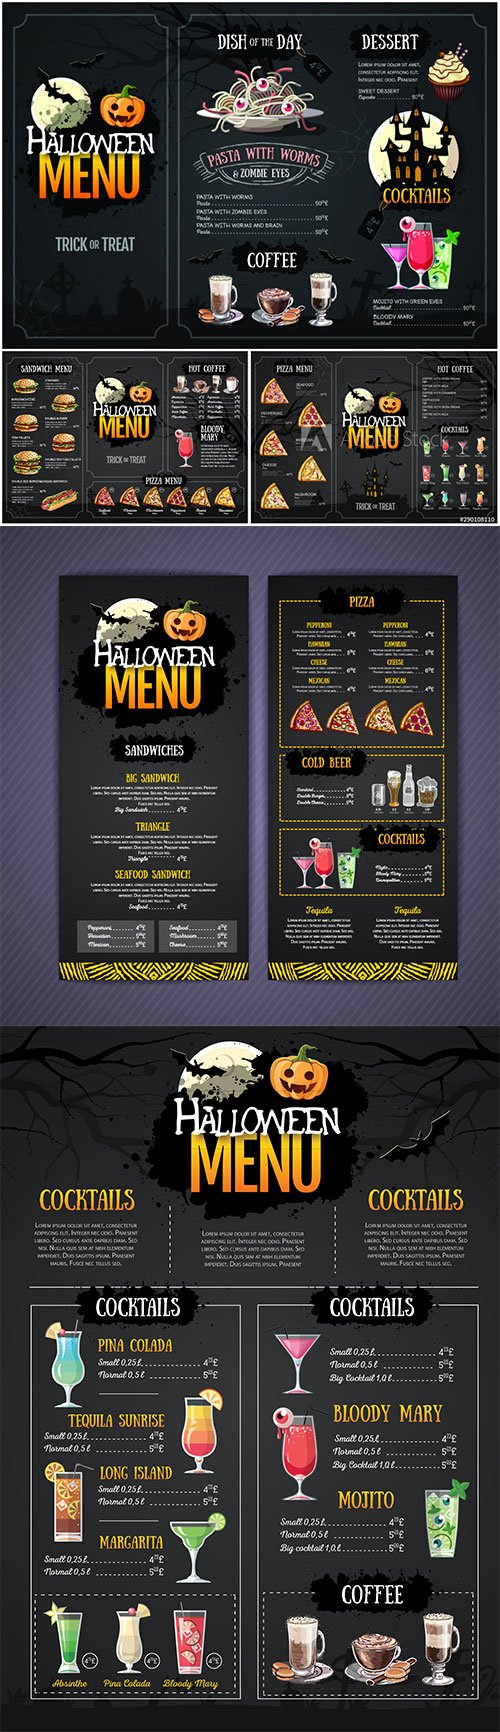 Halloween menu design with jack o lantern, Restaurant menu